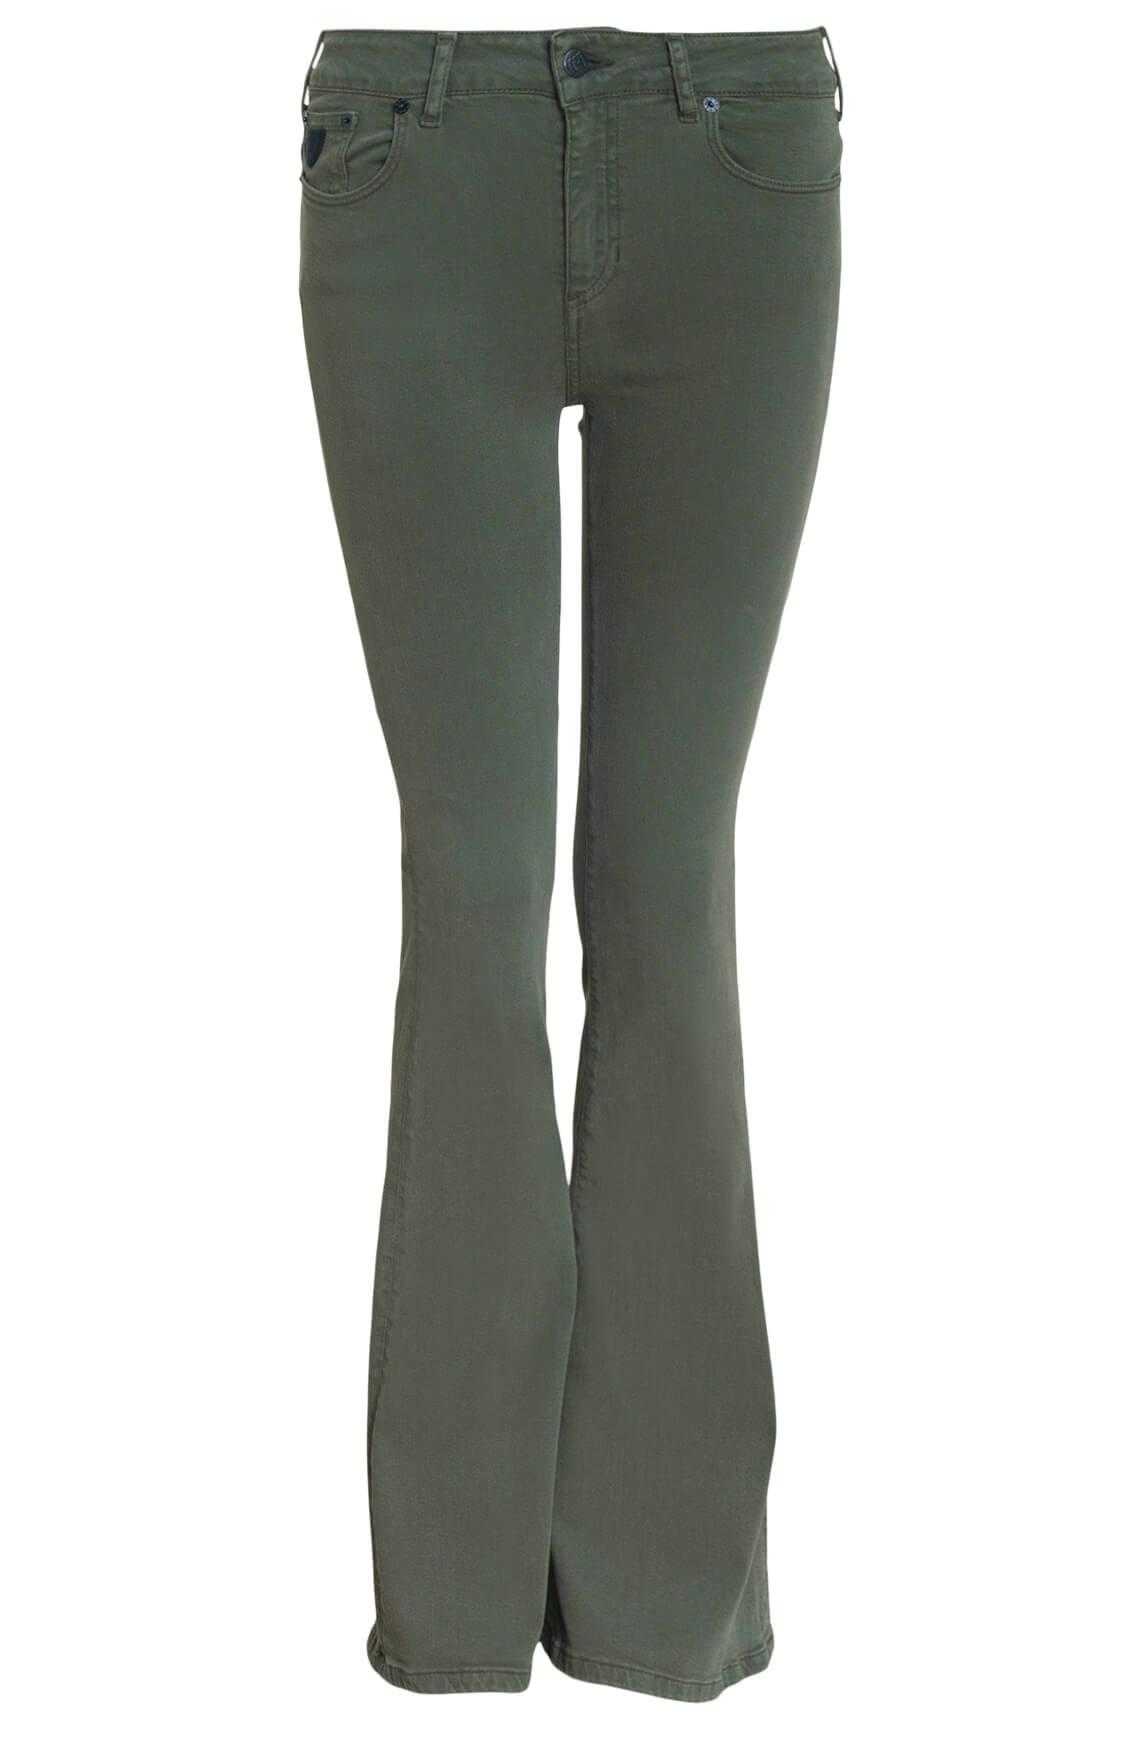 Lois Dames L32 Megalia broek groen